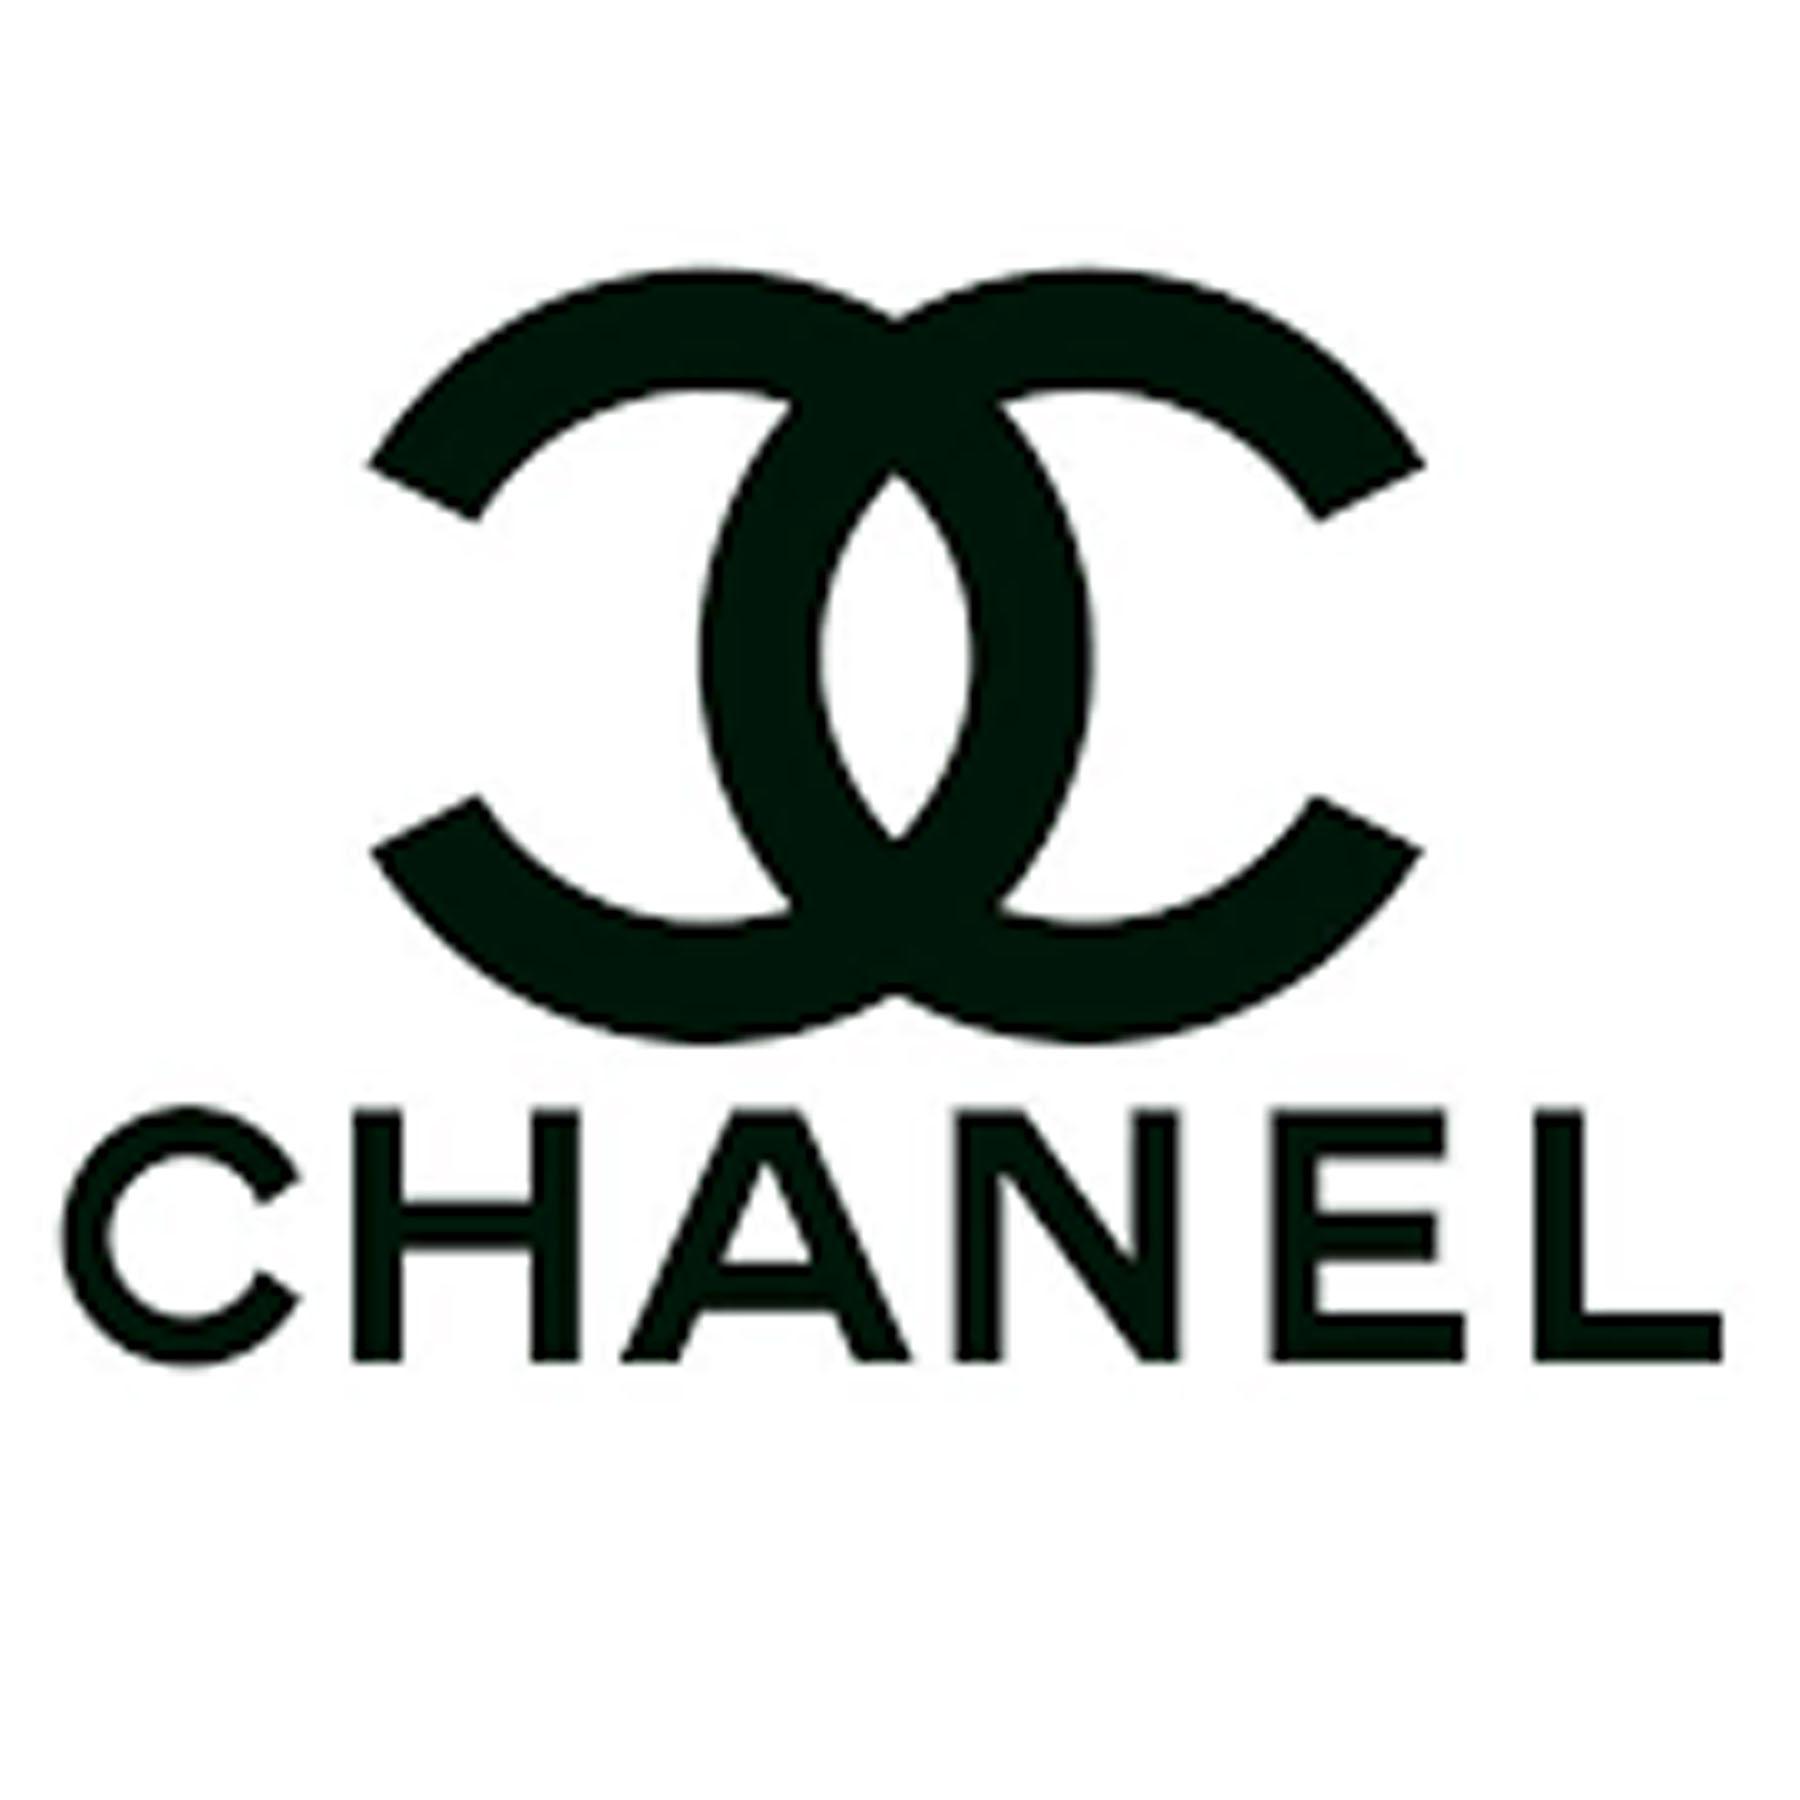 logo Channel Chamberlin Newsome.jpg